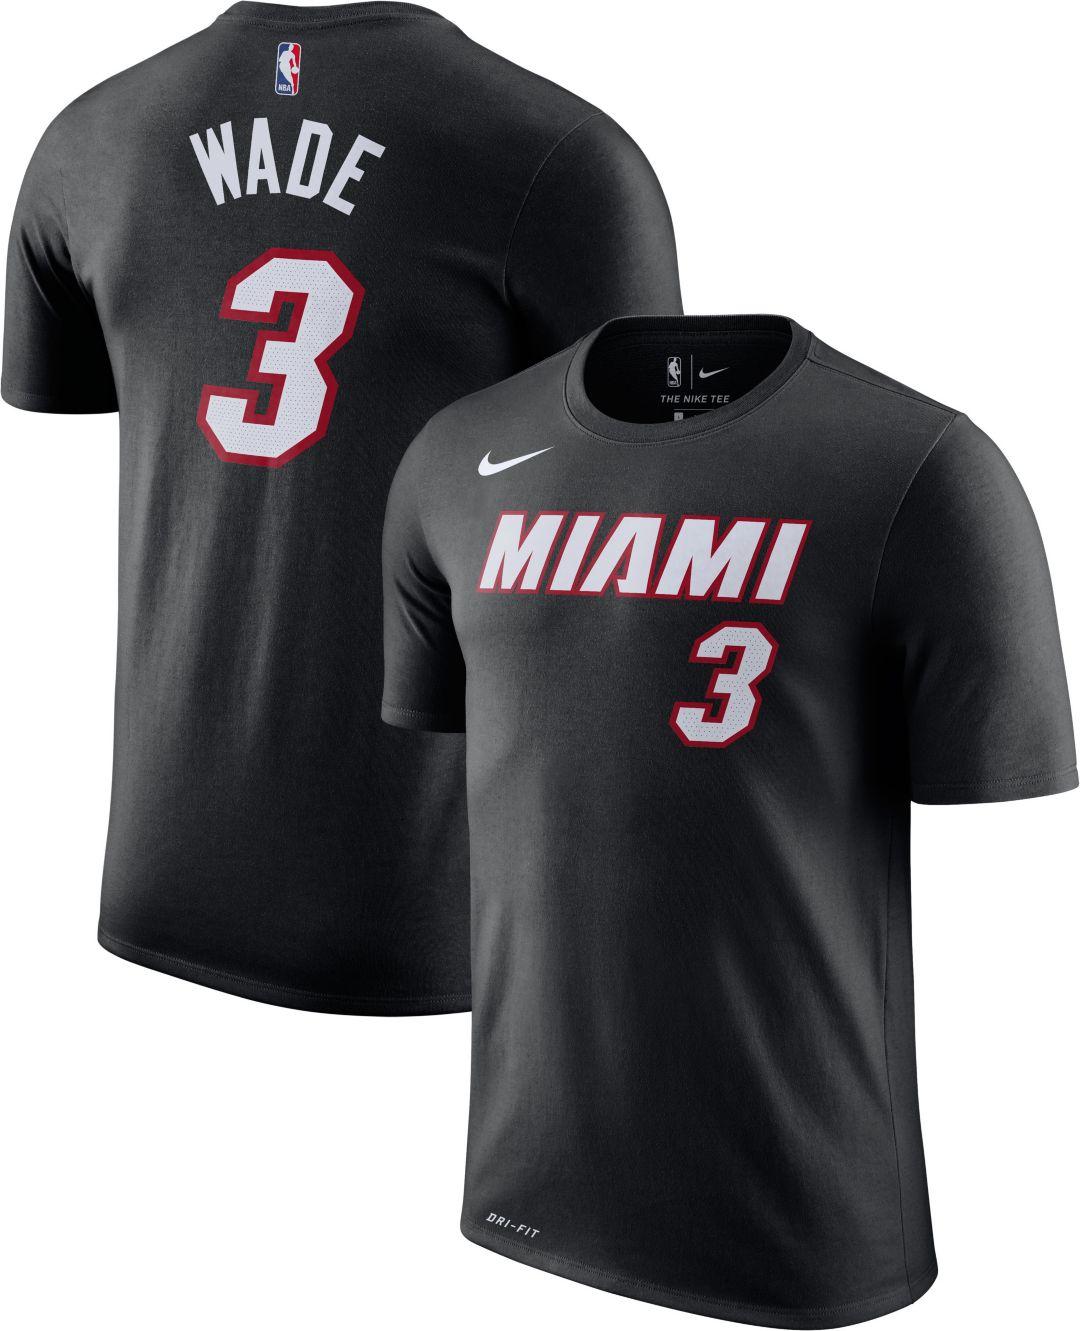 promo code b83d1 a6027 Nike Men s Miami Heat Dwyane Wade  3 Dri-FIT Black T-Shirt   DICK S ...